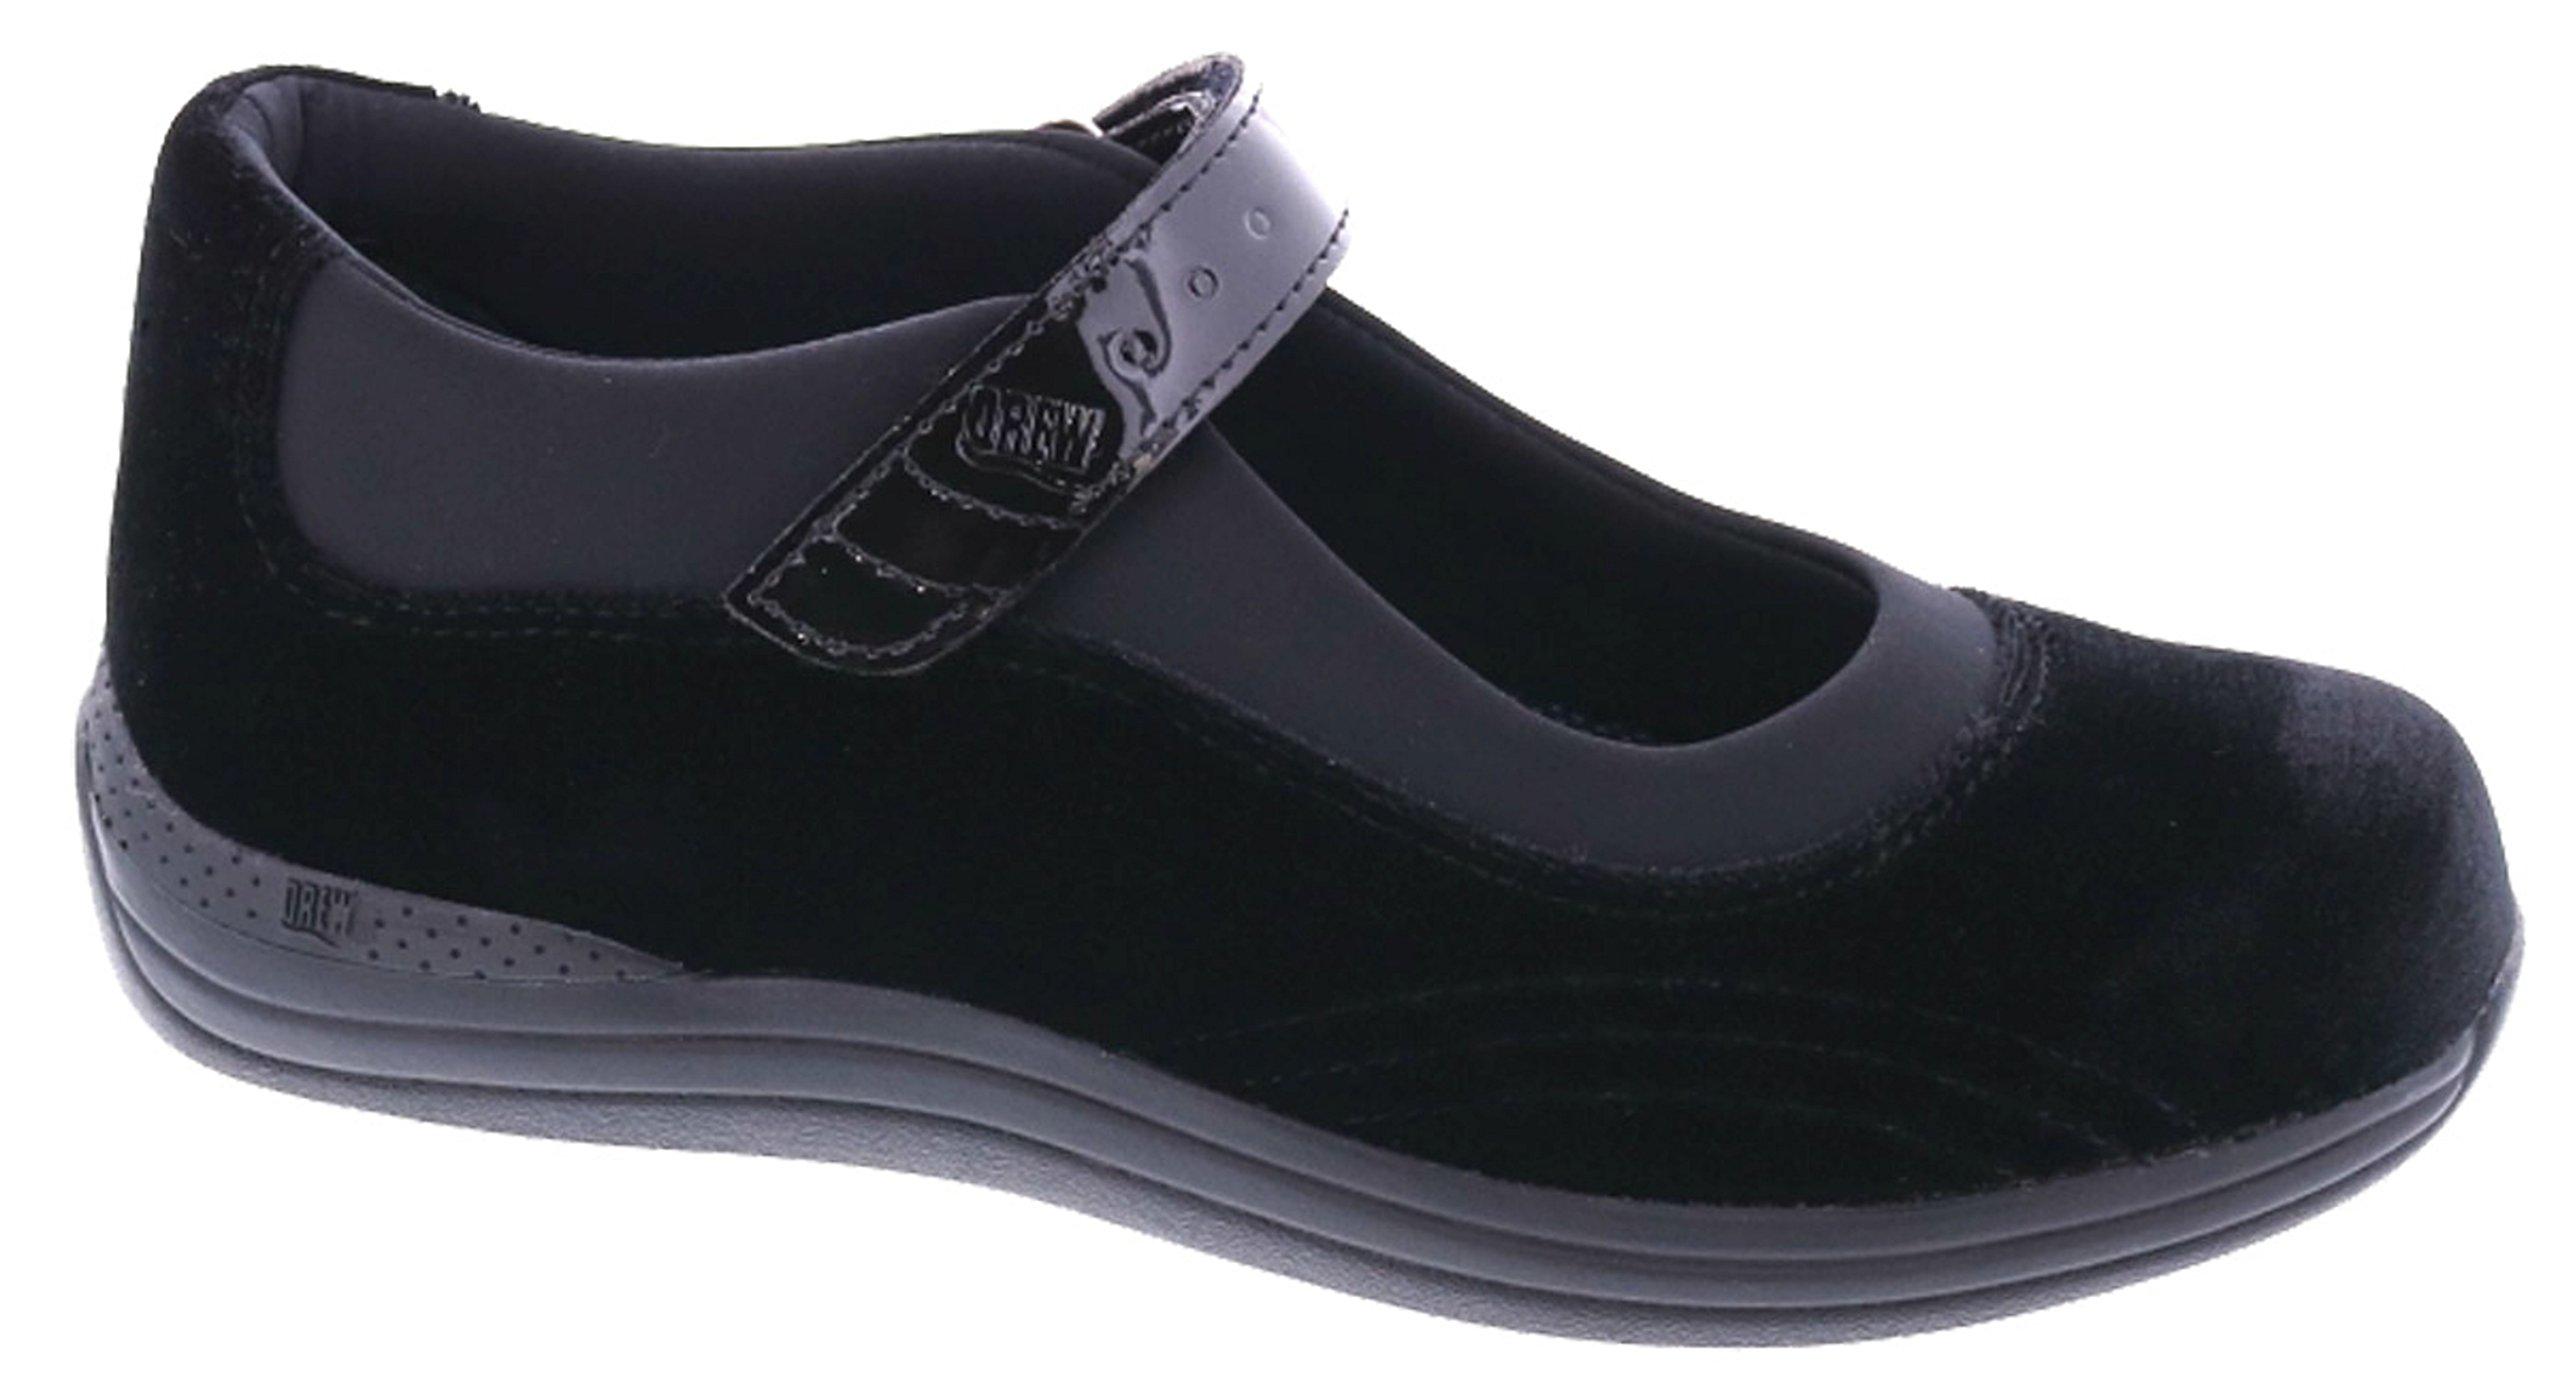 Drew Shoes Rose Women's Therapeutic Diabetic Extra Depth Shoe: Black/Velvet 11.0 X-Wide (2E) Velcro